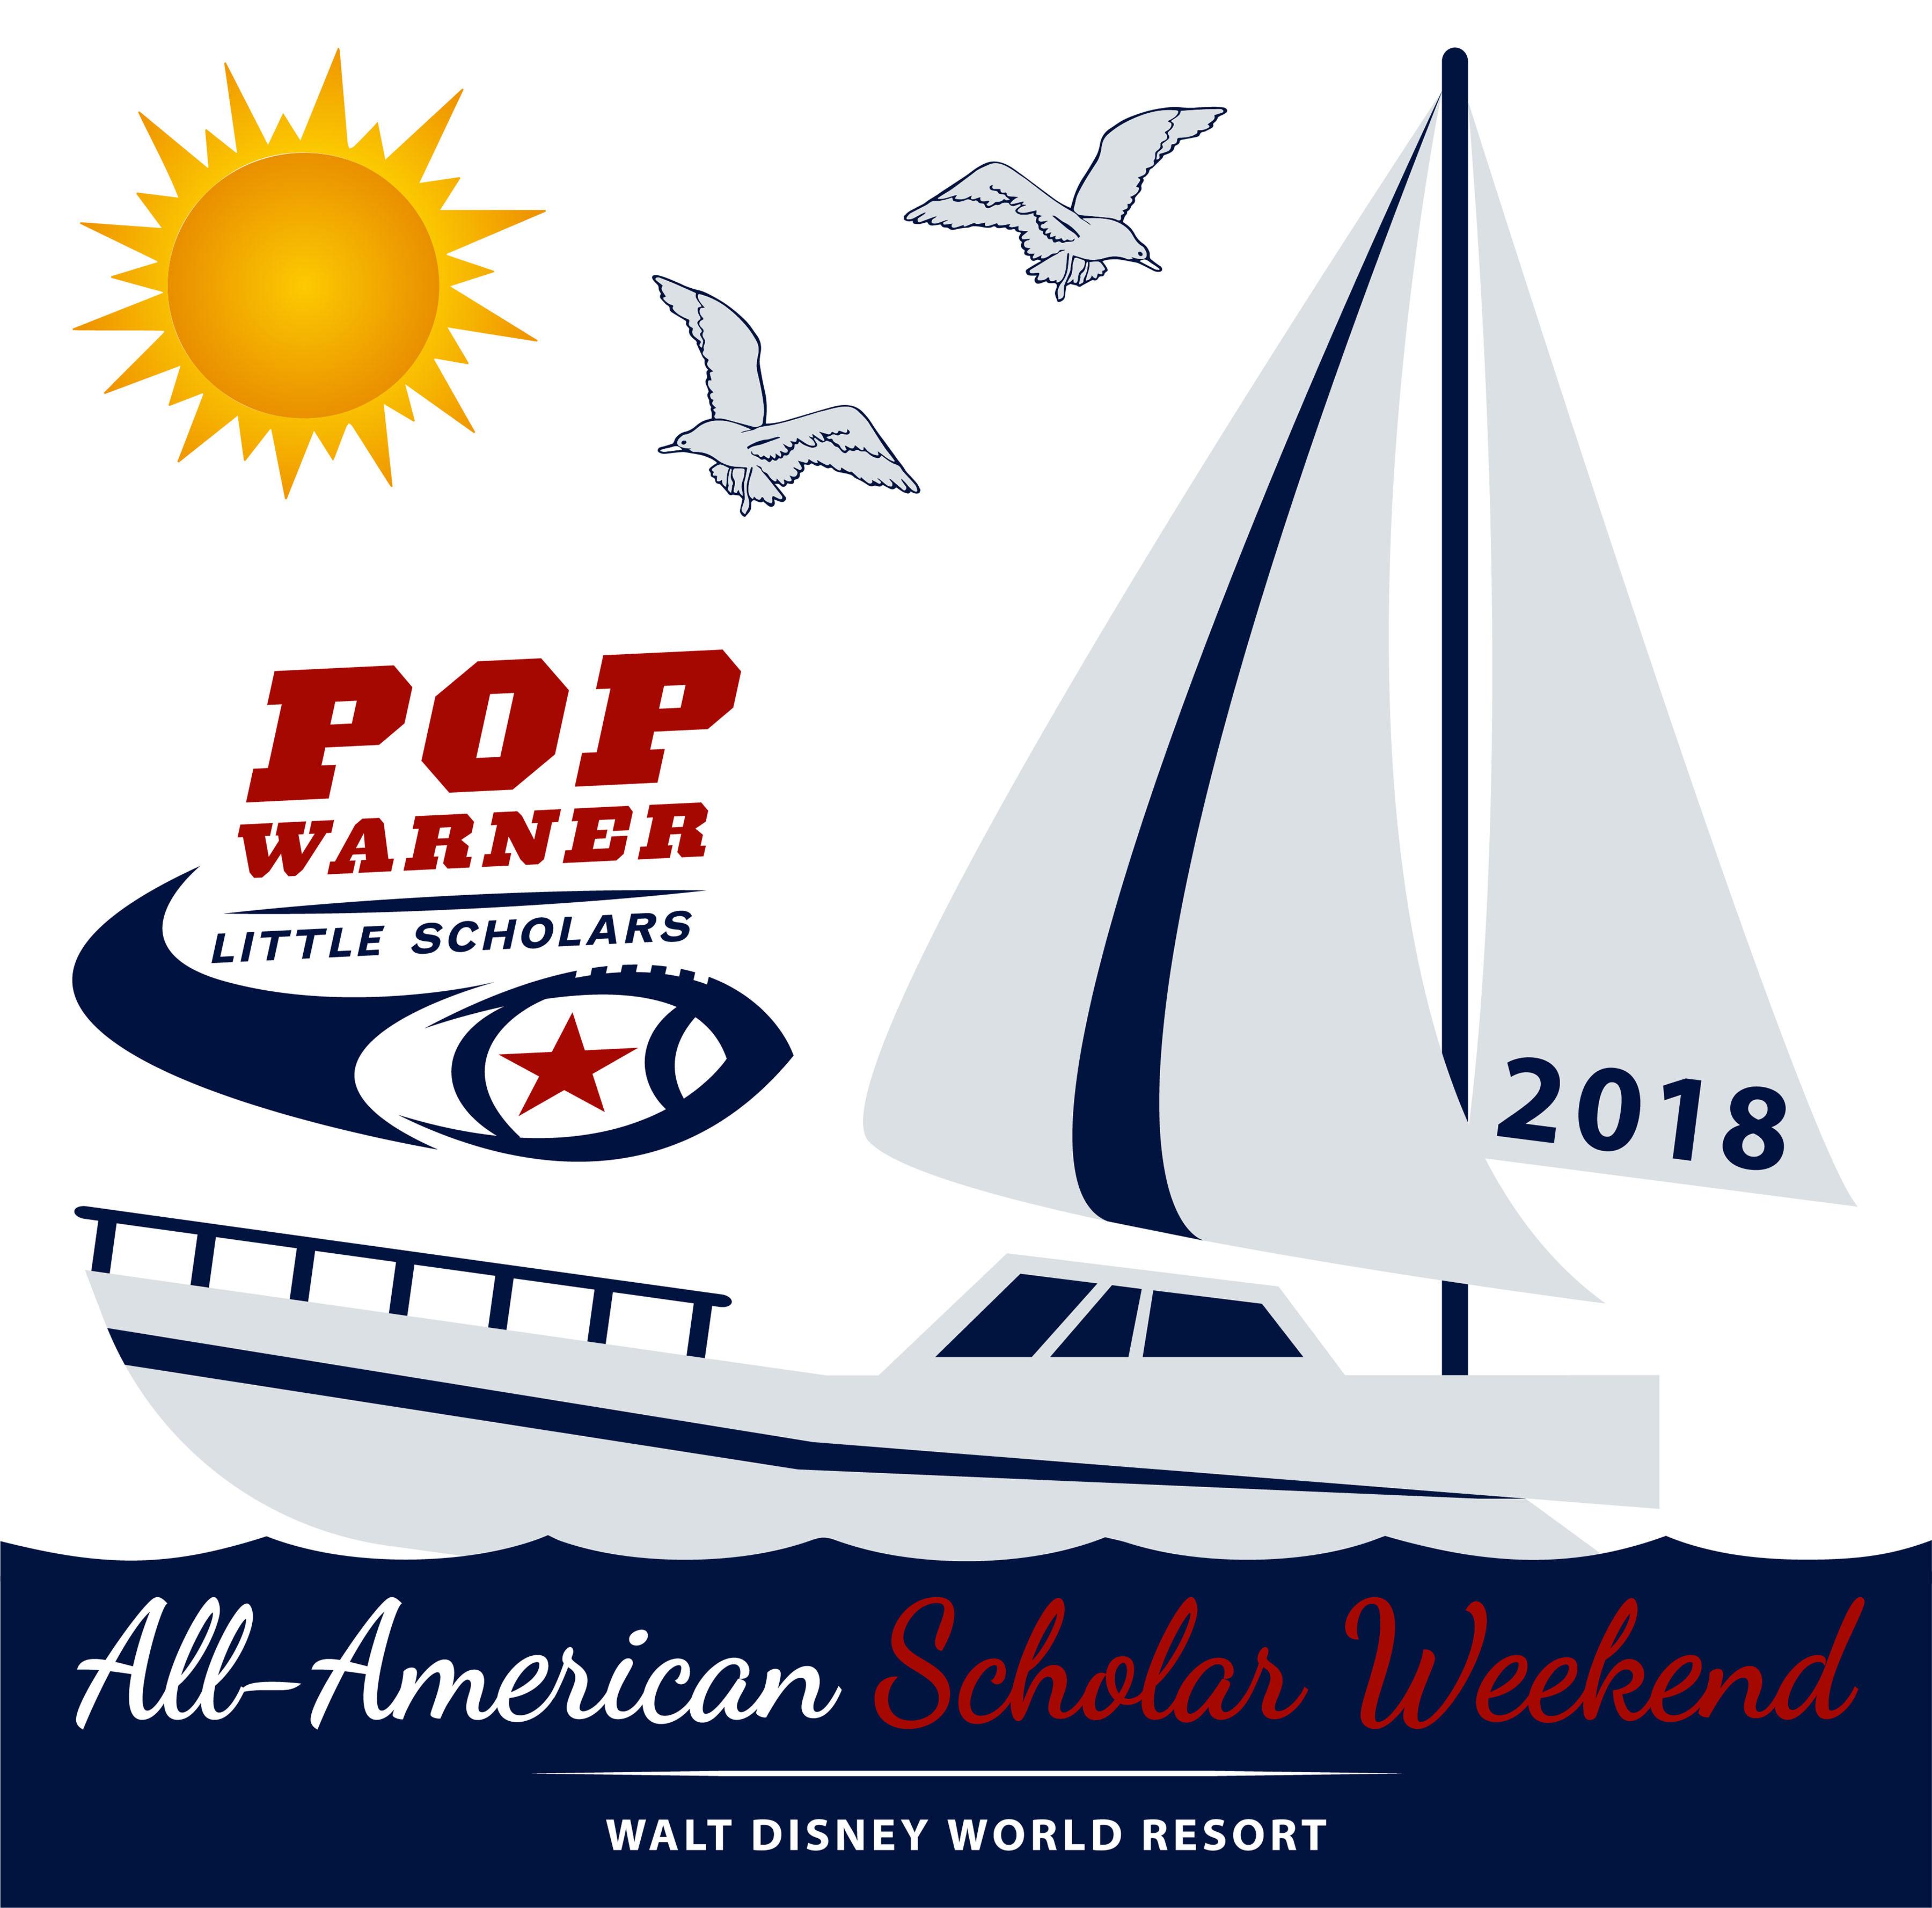 Pop Warner All-American Scholar Weekend